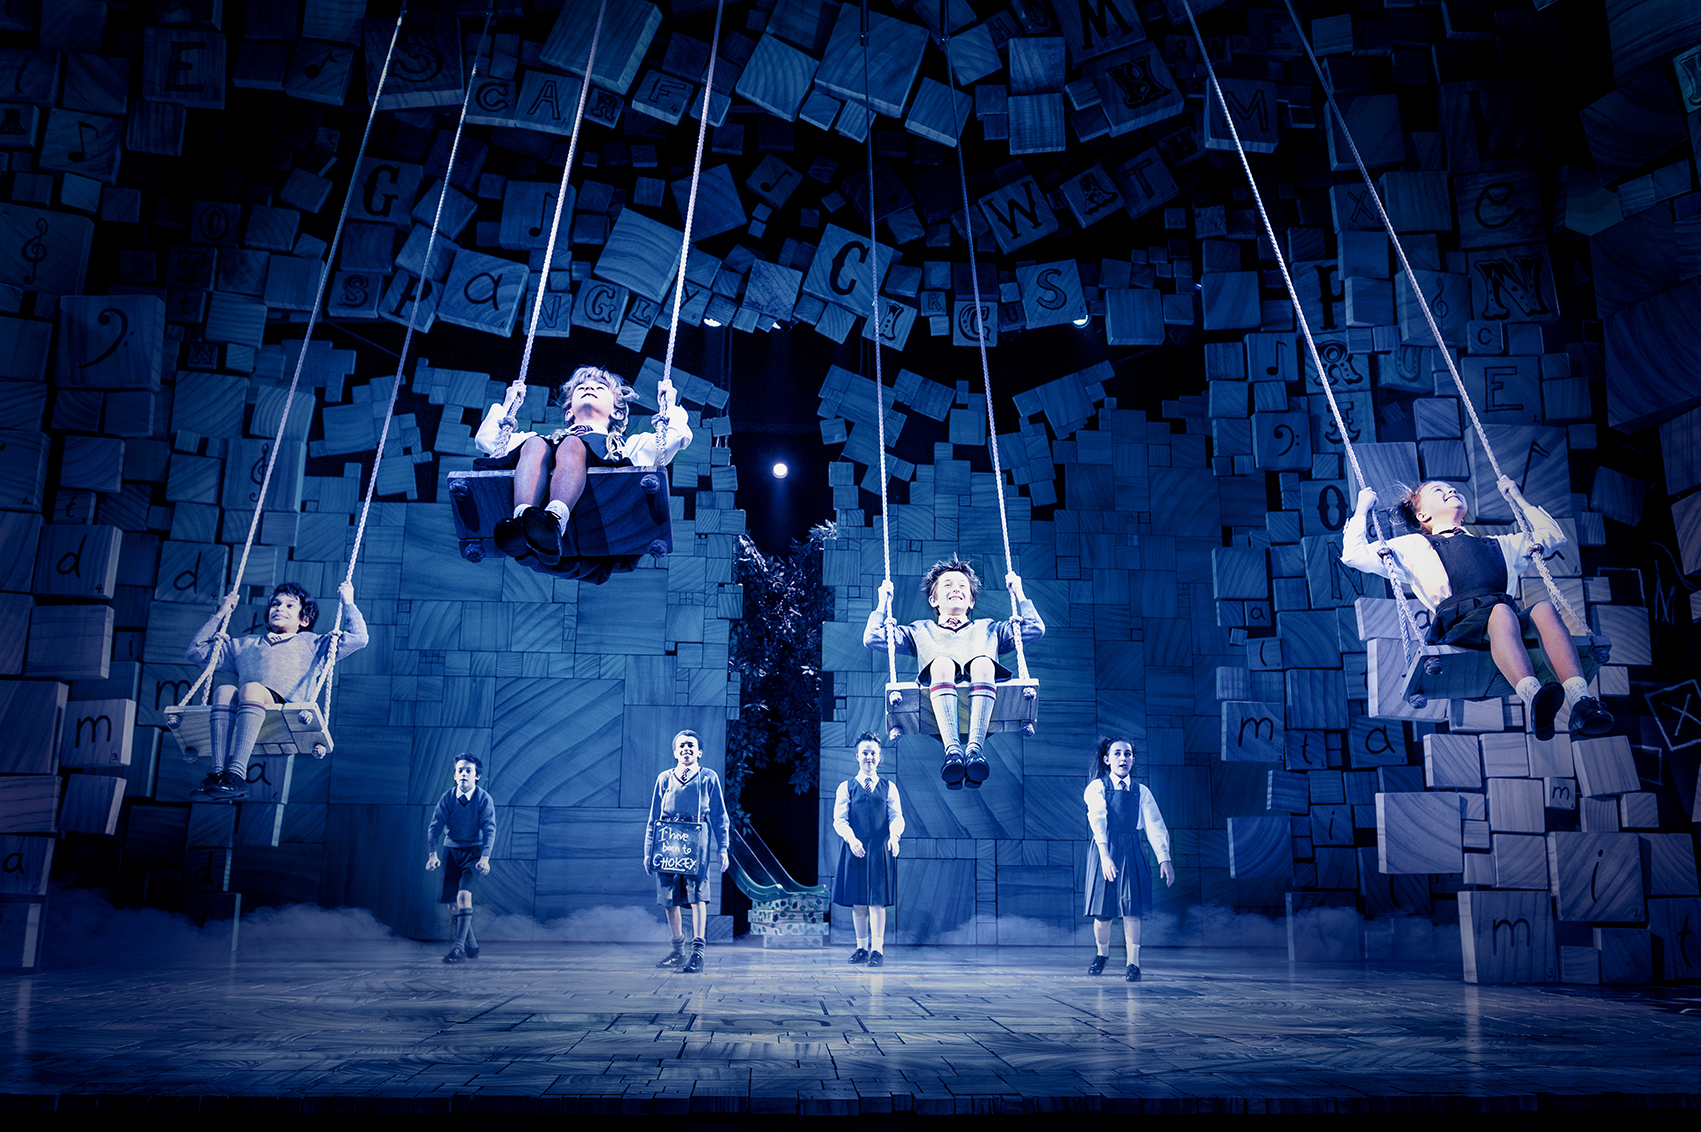 Matilda_The_Musical_Photo_by_Manuel_Harlan_c_The_Royal_Shakespeare_Company.jpg